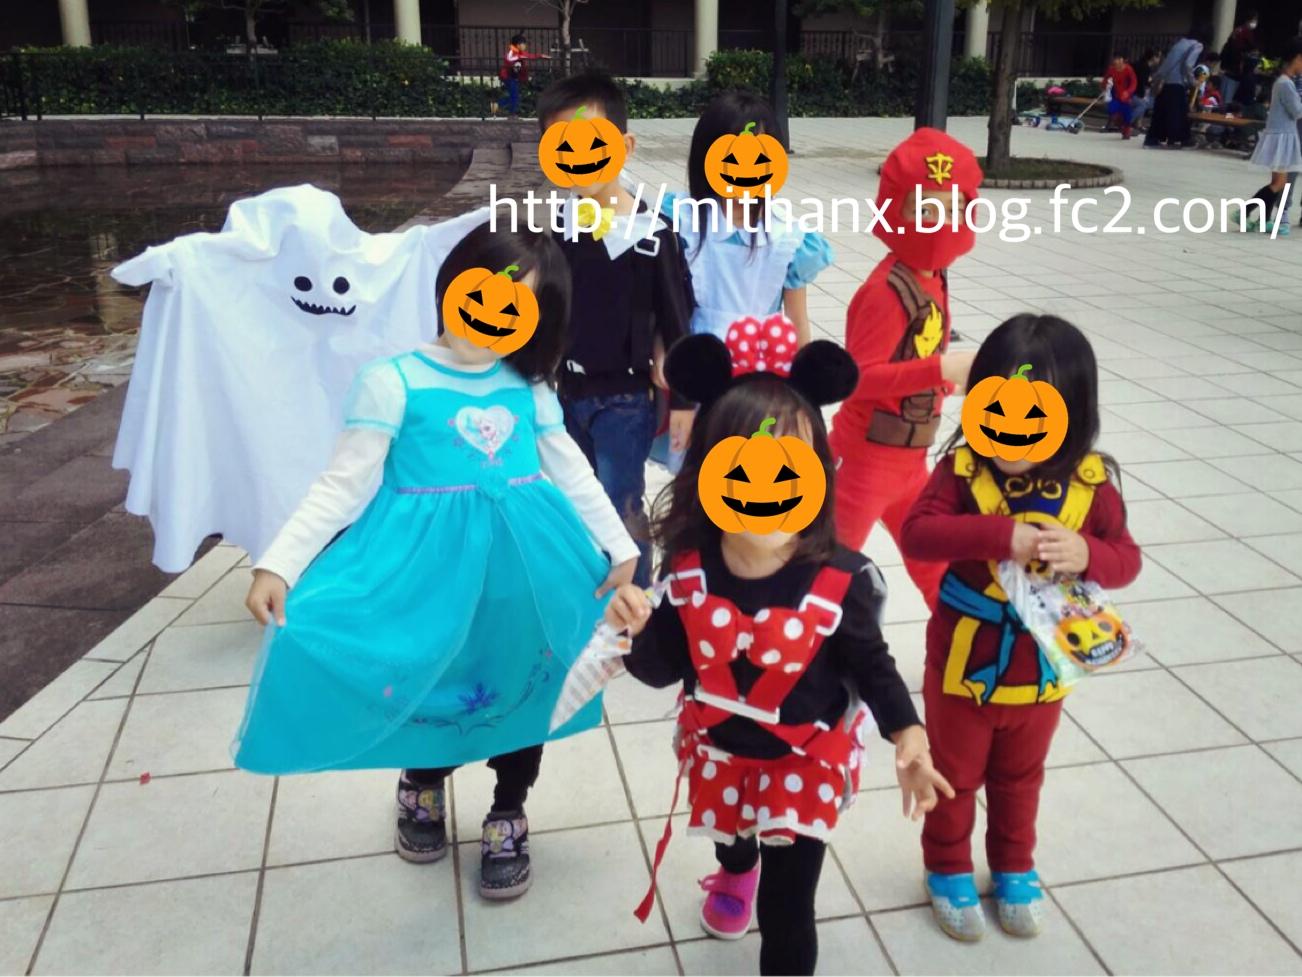 201610300021418a4.jpg